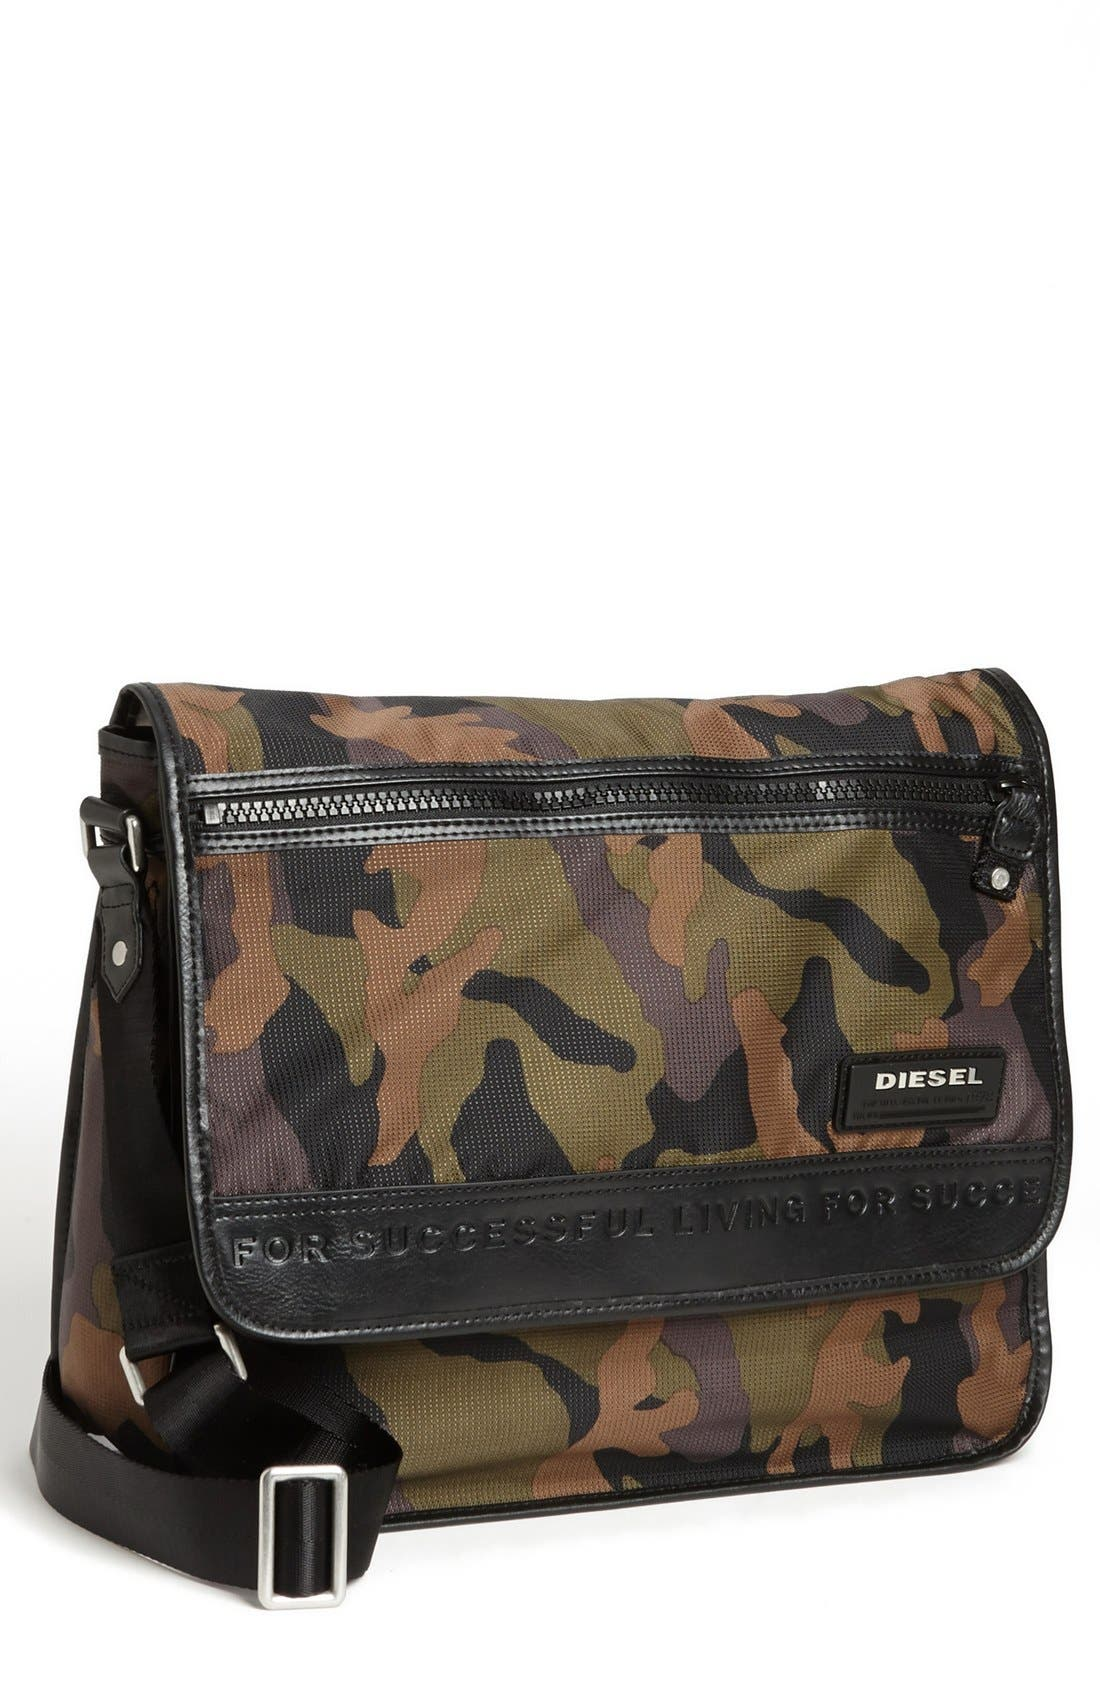 Main Image - DIESEL® 'On The Road Twice' Messenger Bag